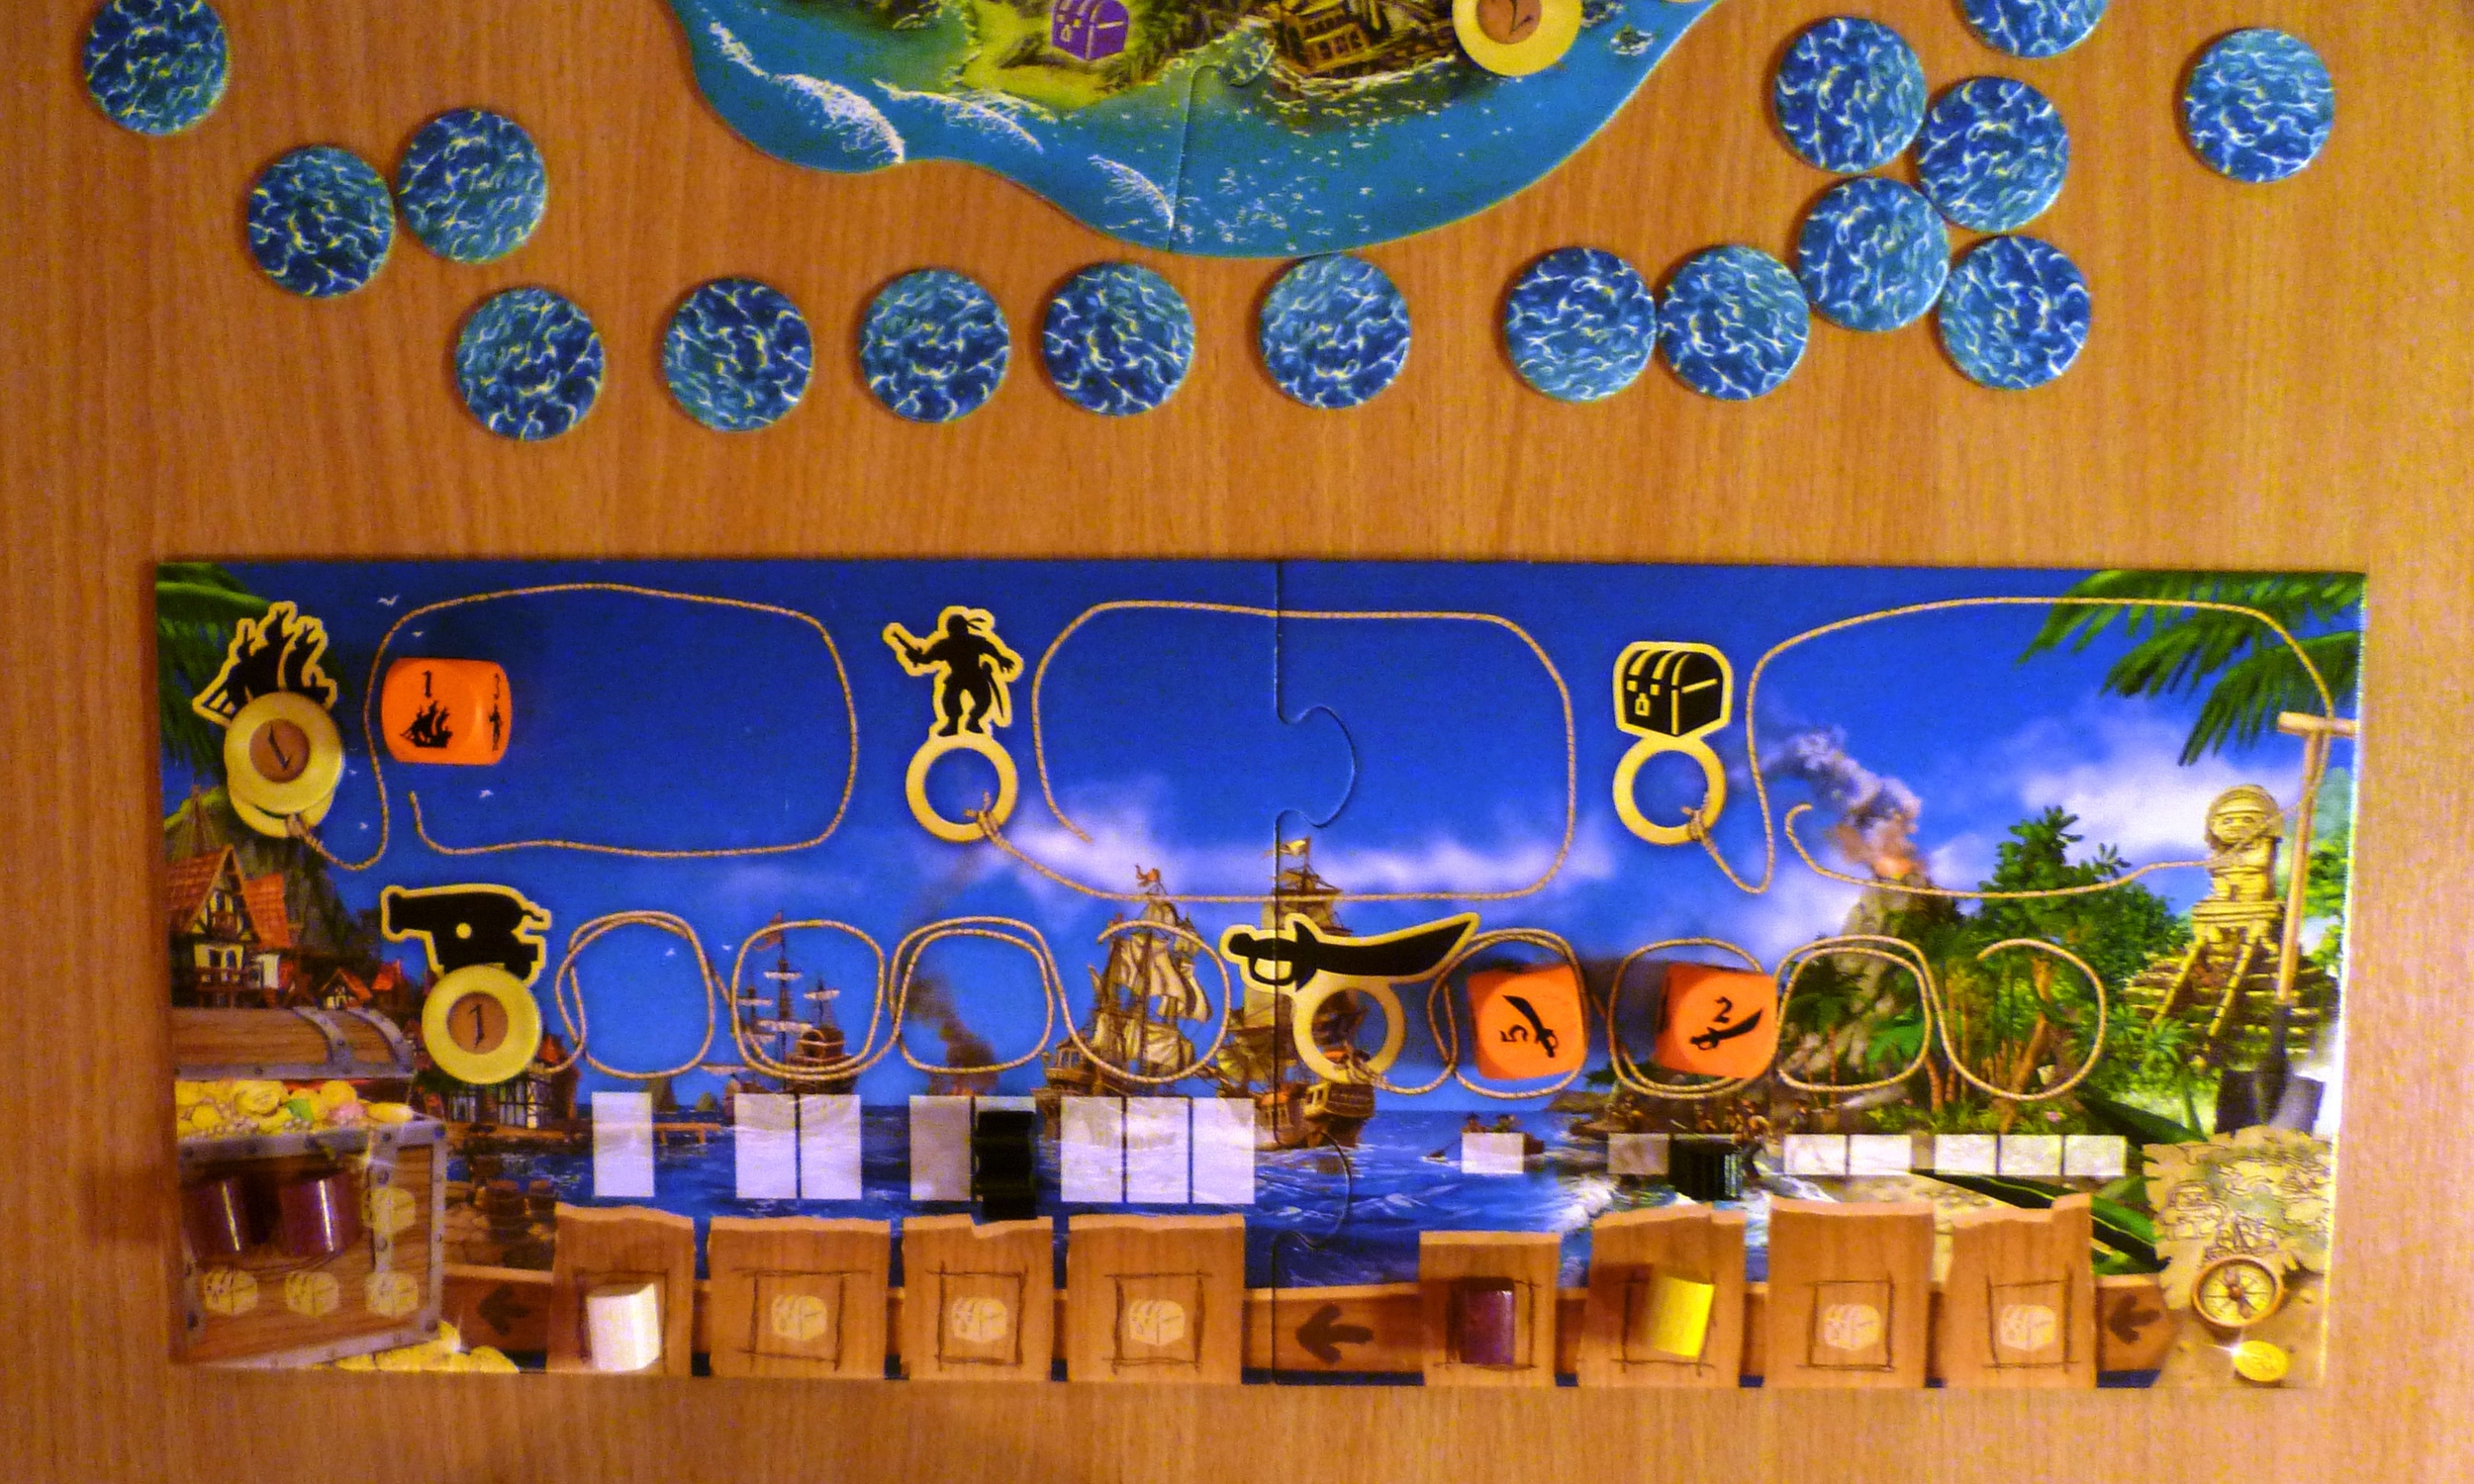 Tortuga players board